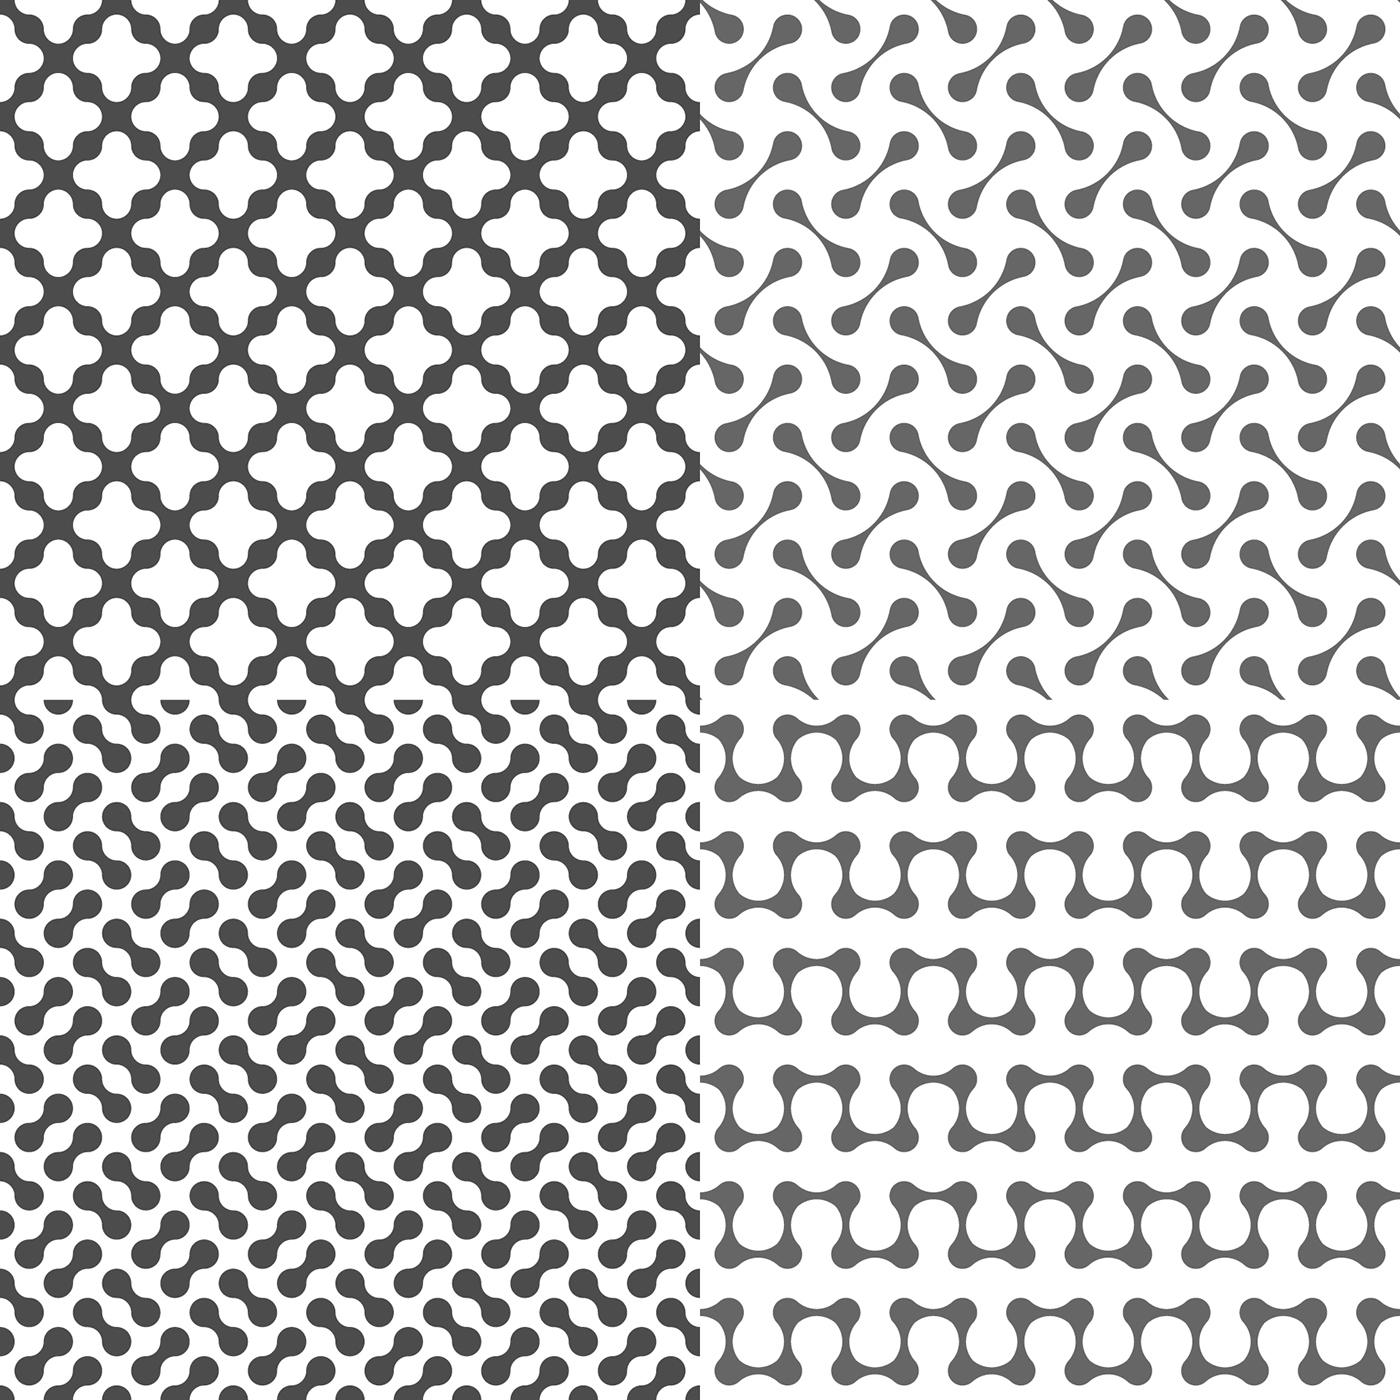 Drops Patterns Simple Design Inspiration